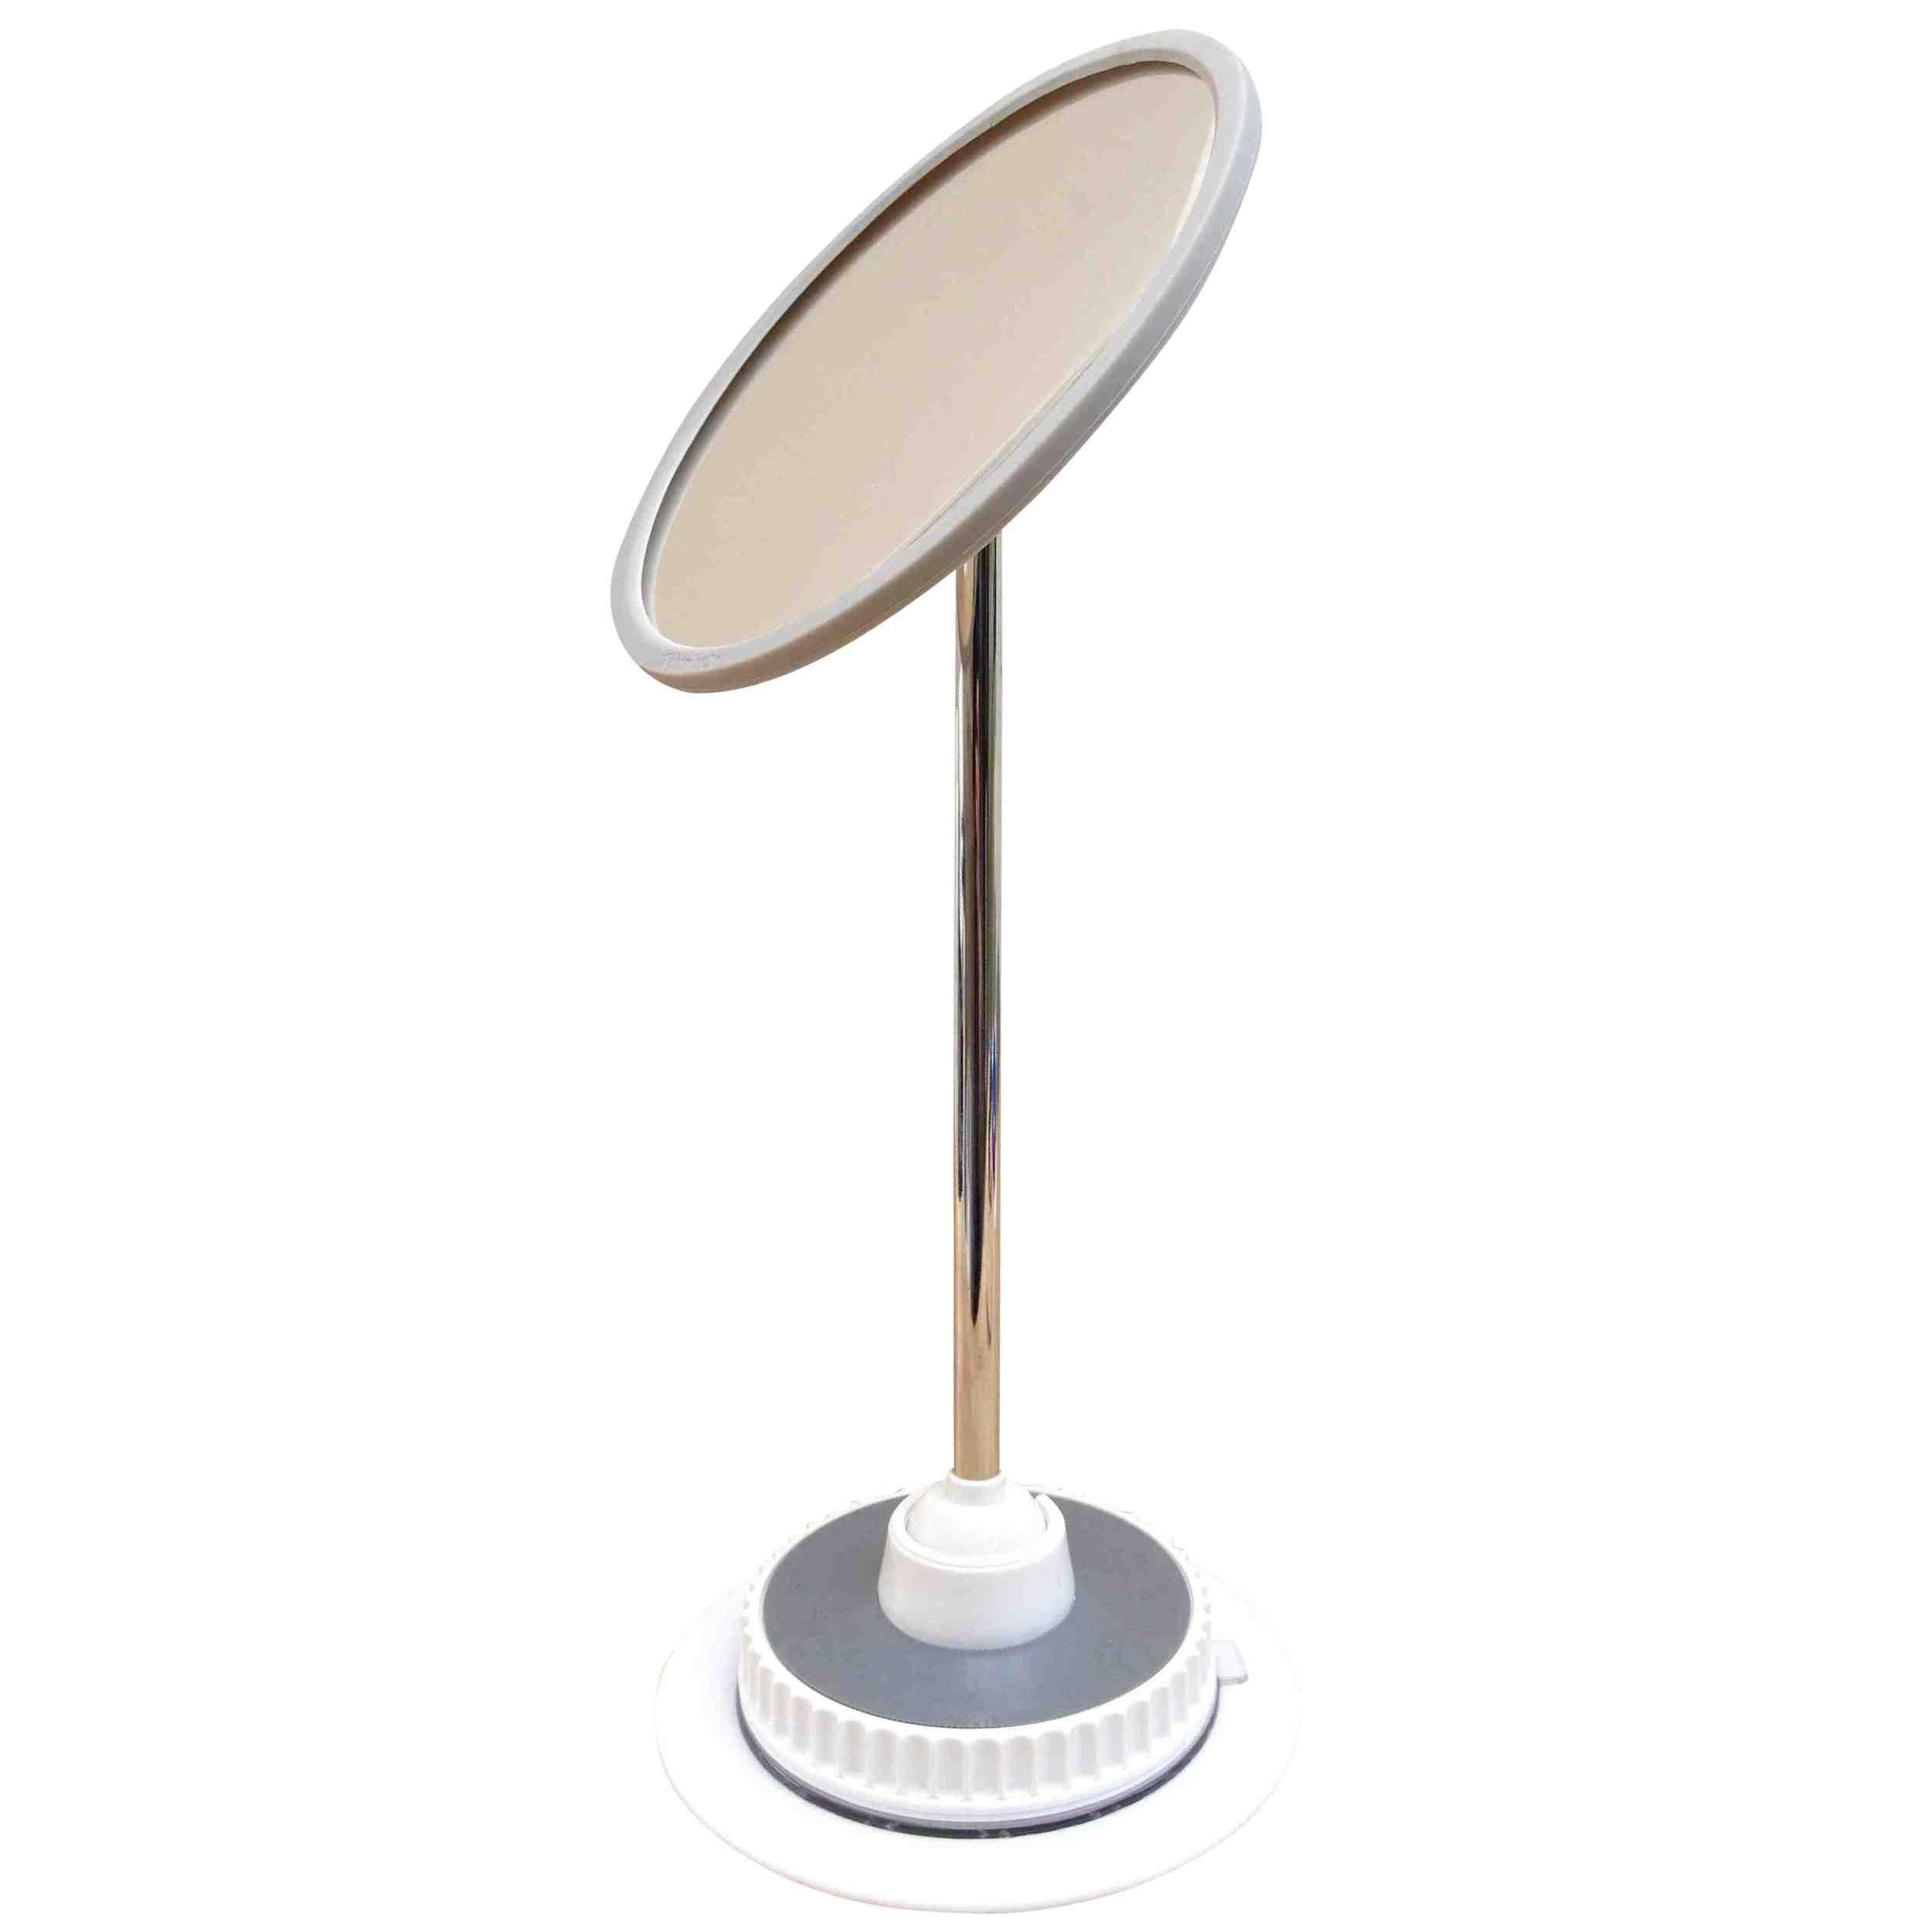 Grand Miroir Grossissant 6x Ou 10x Avec Bras Intelligent Twistmirror